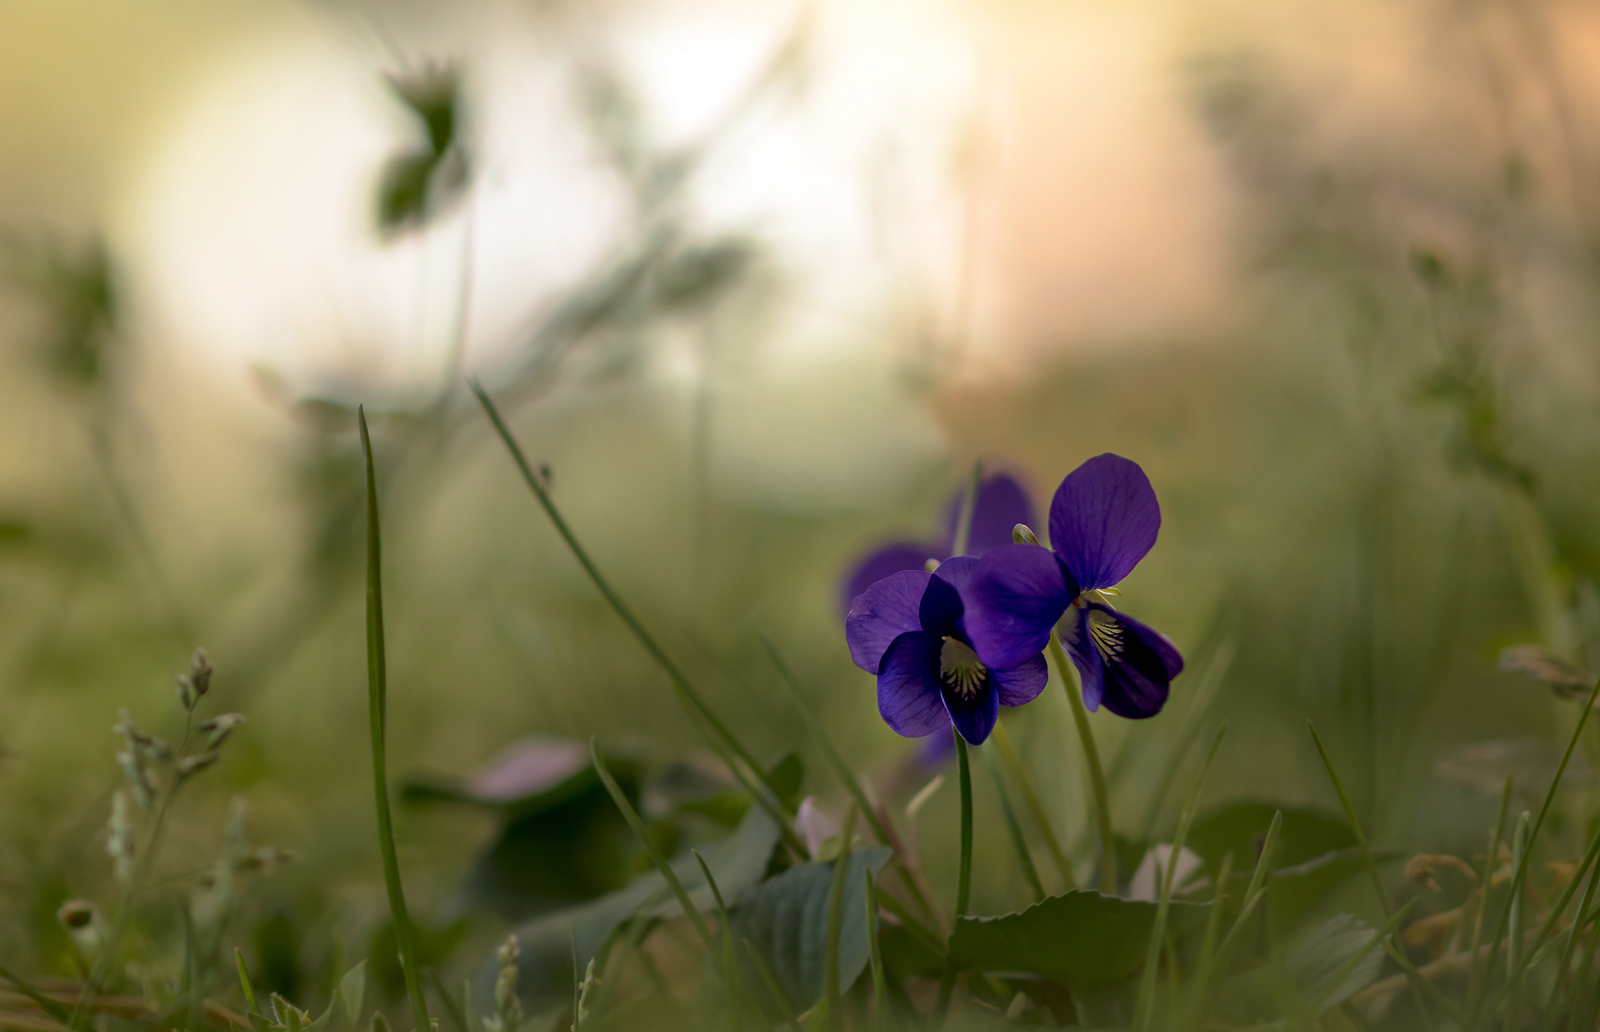 макро,цветы,природа,флора,фиалки,весна,, Антонина Яновска